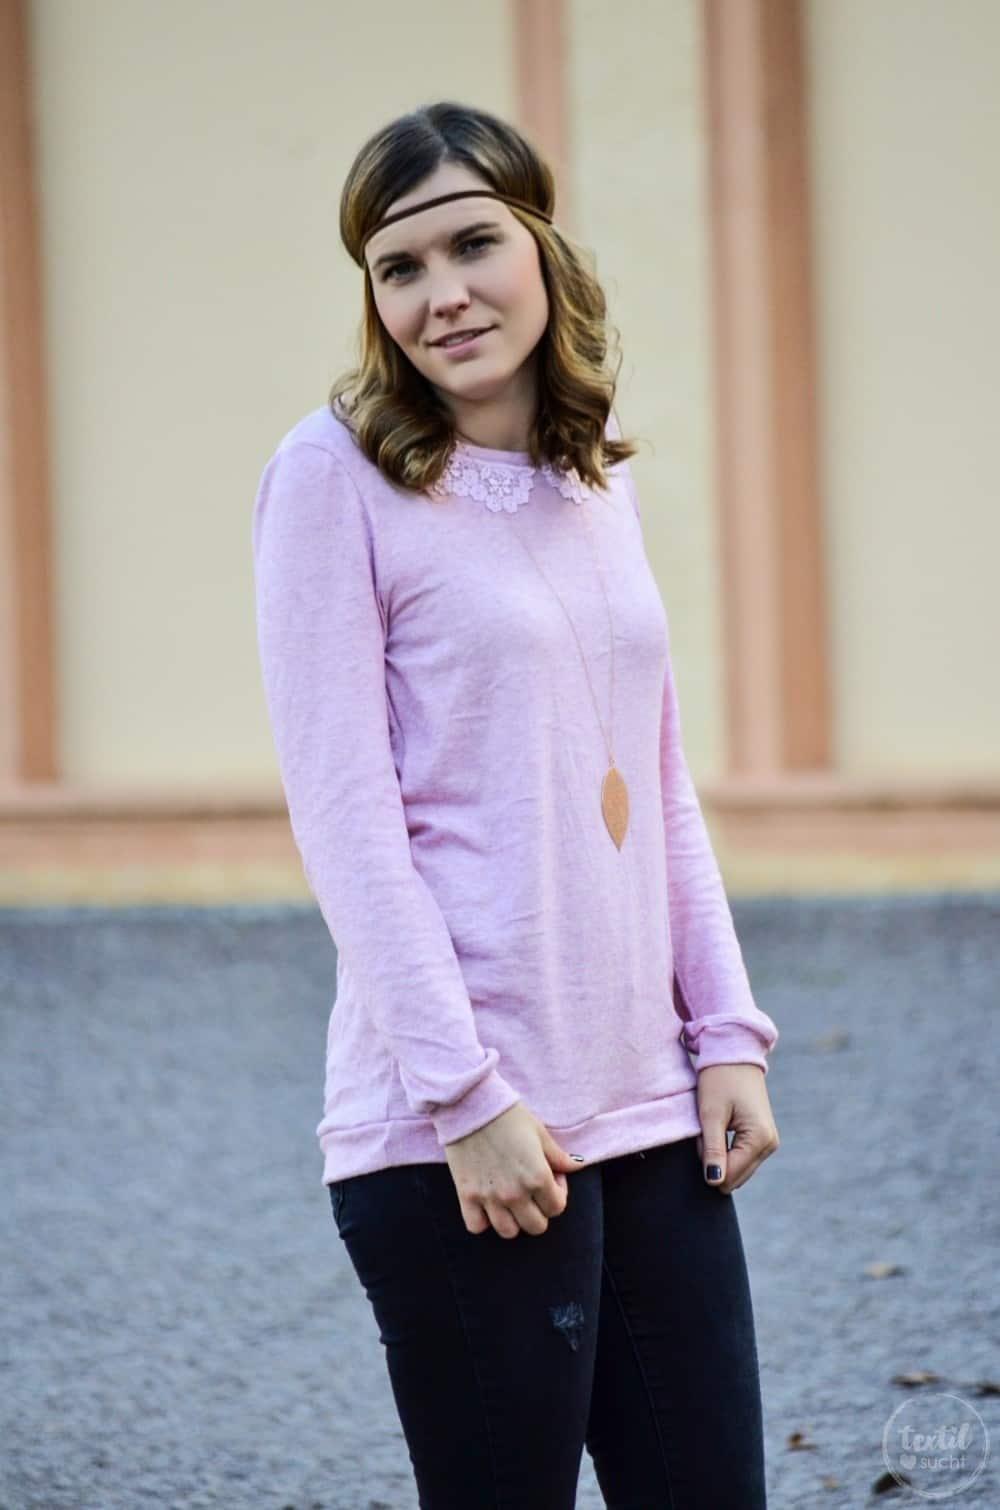 Pullover nähen: Schnittmuster Leara mit Spitzenkragen - Bild 1 | textilsucht.de